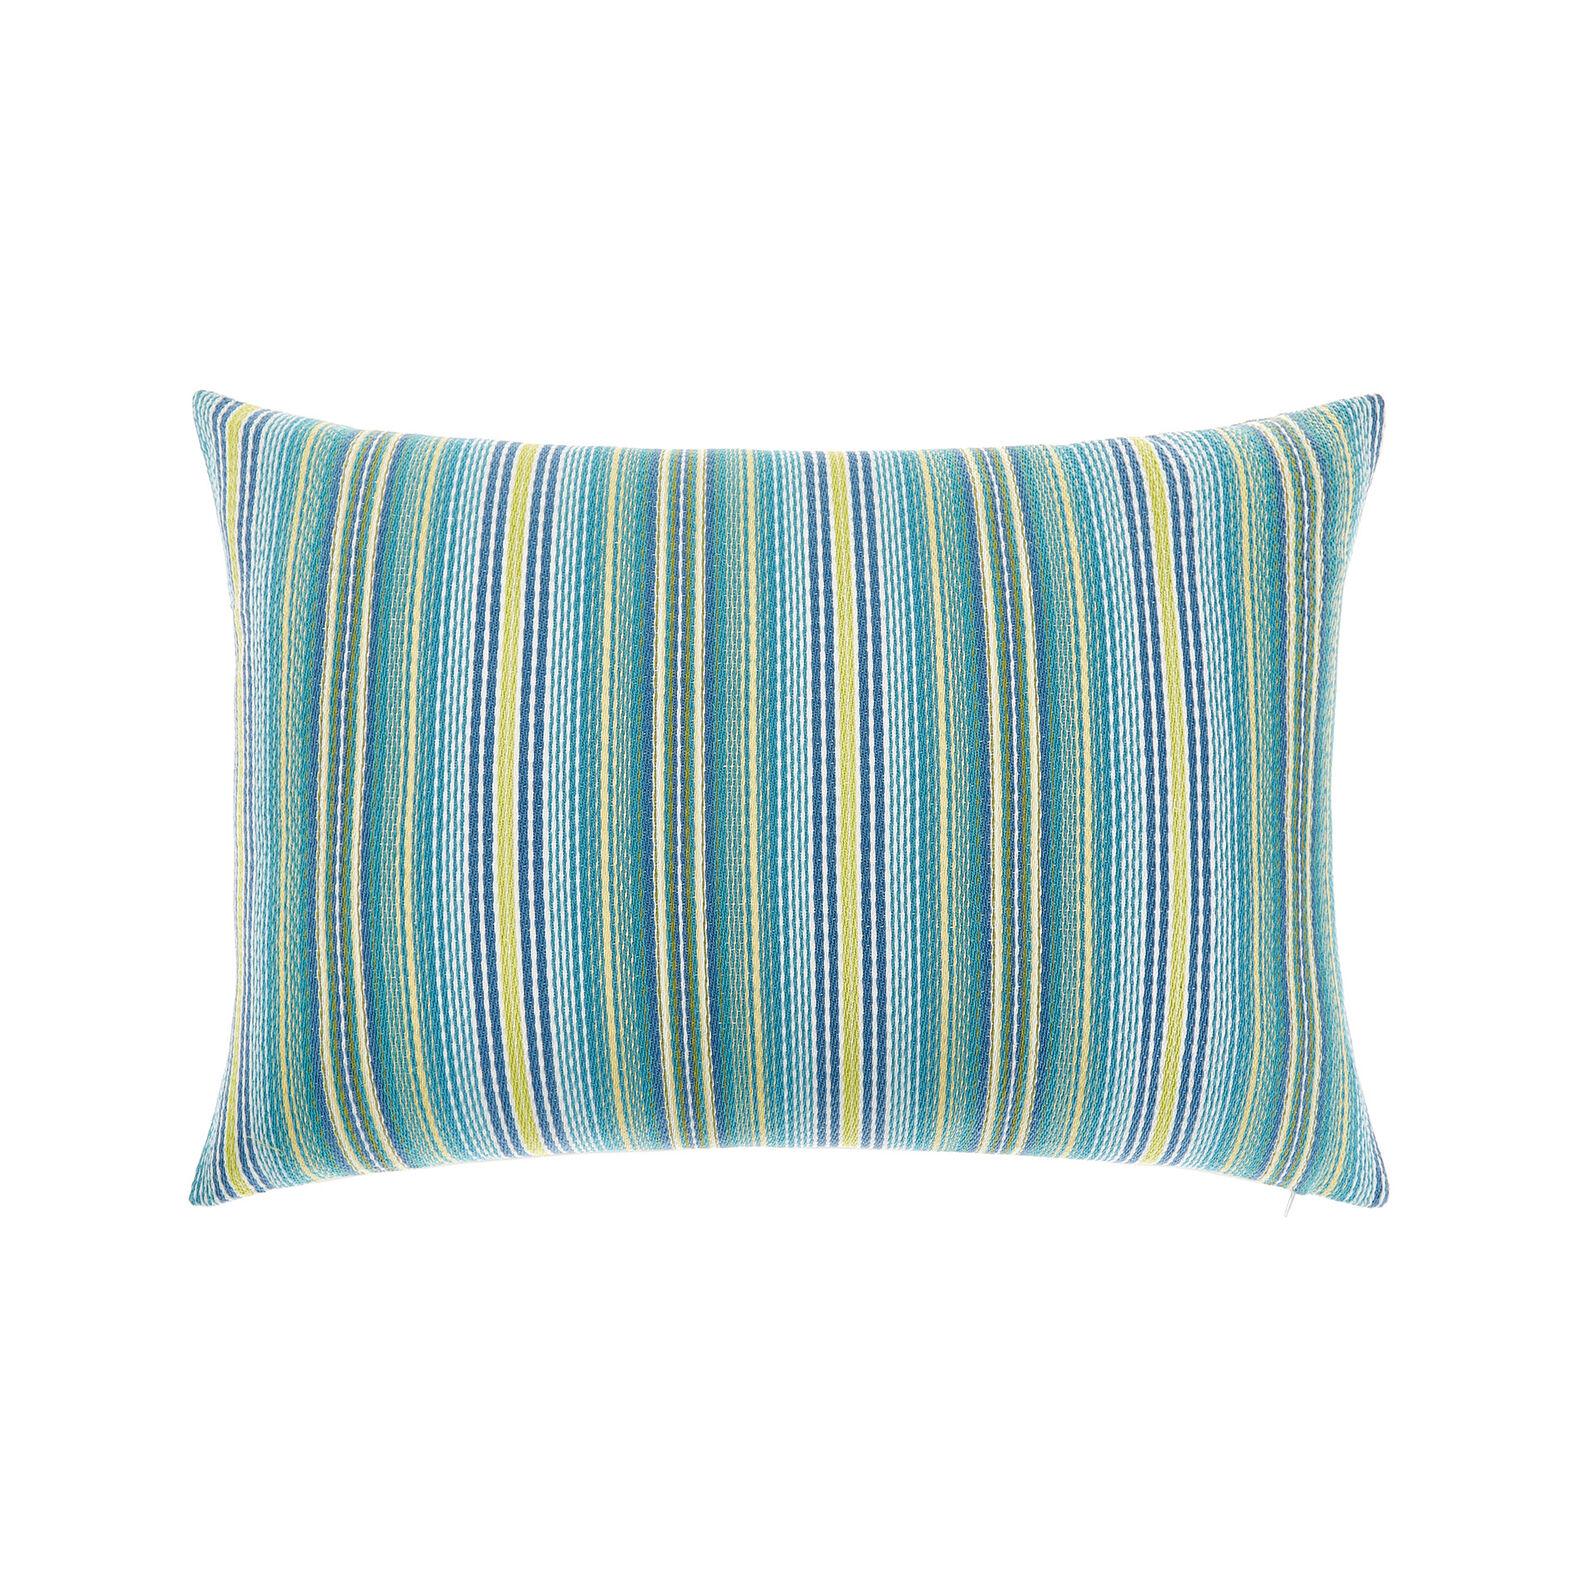 Jacquard striped cushion